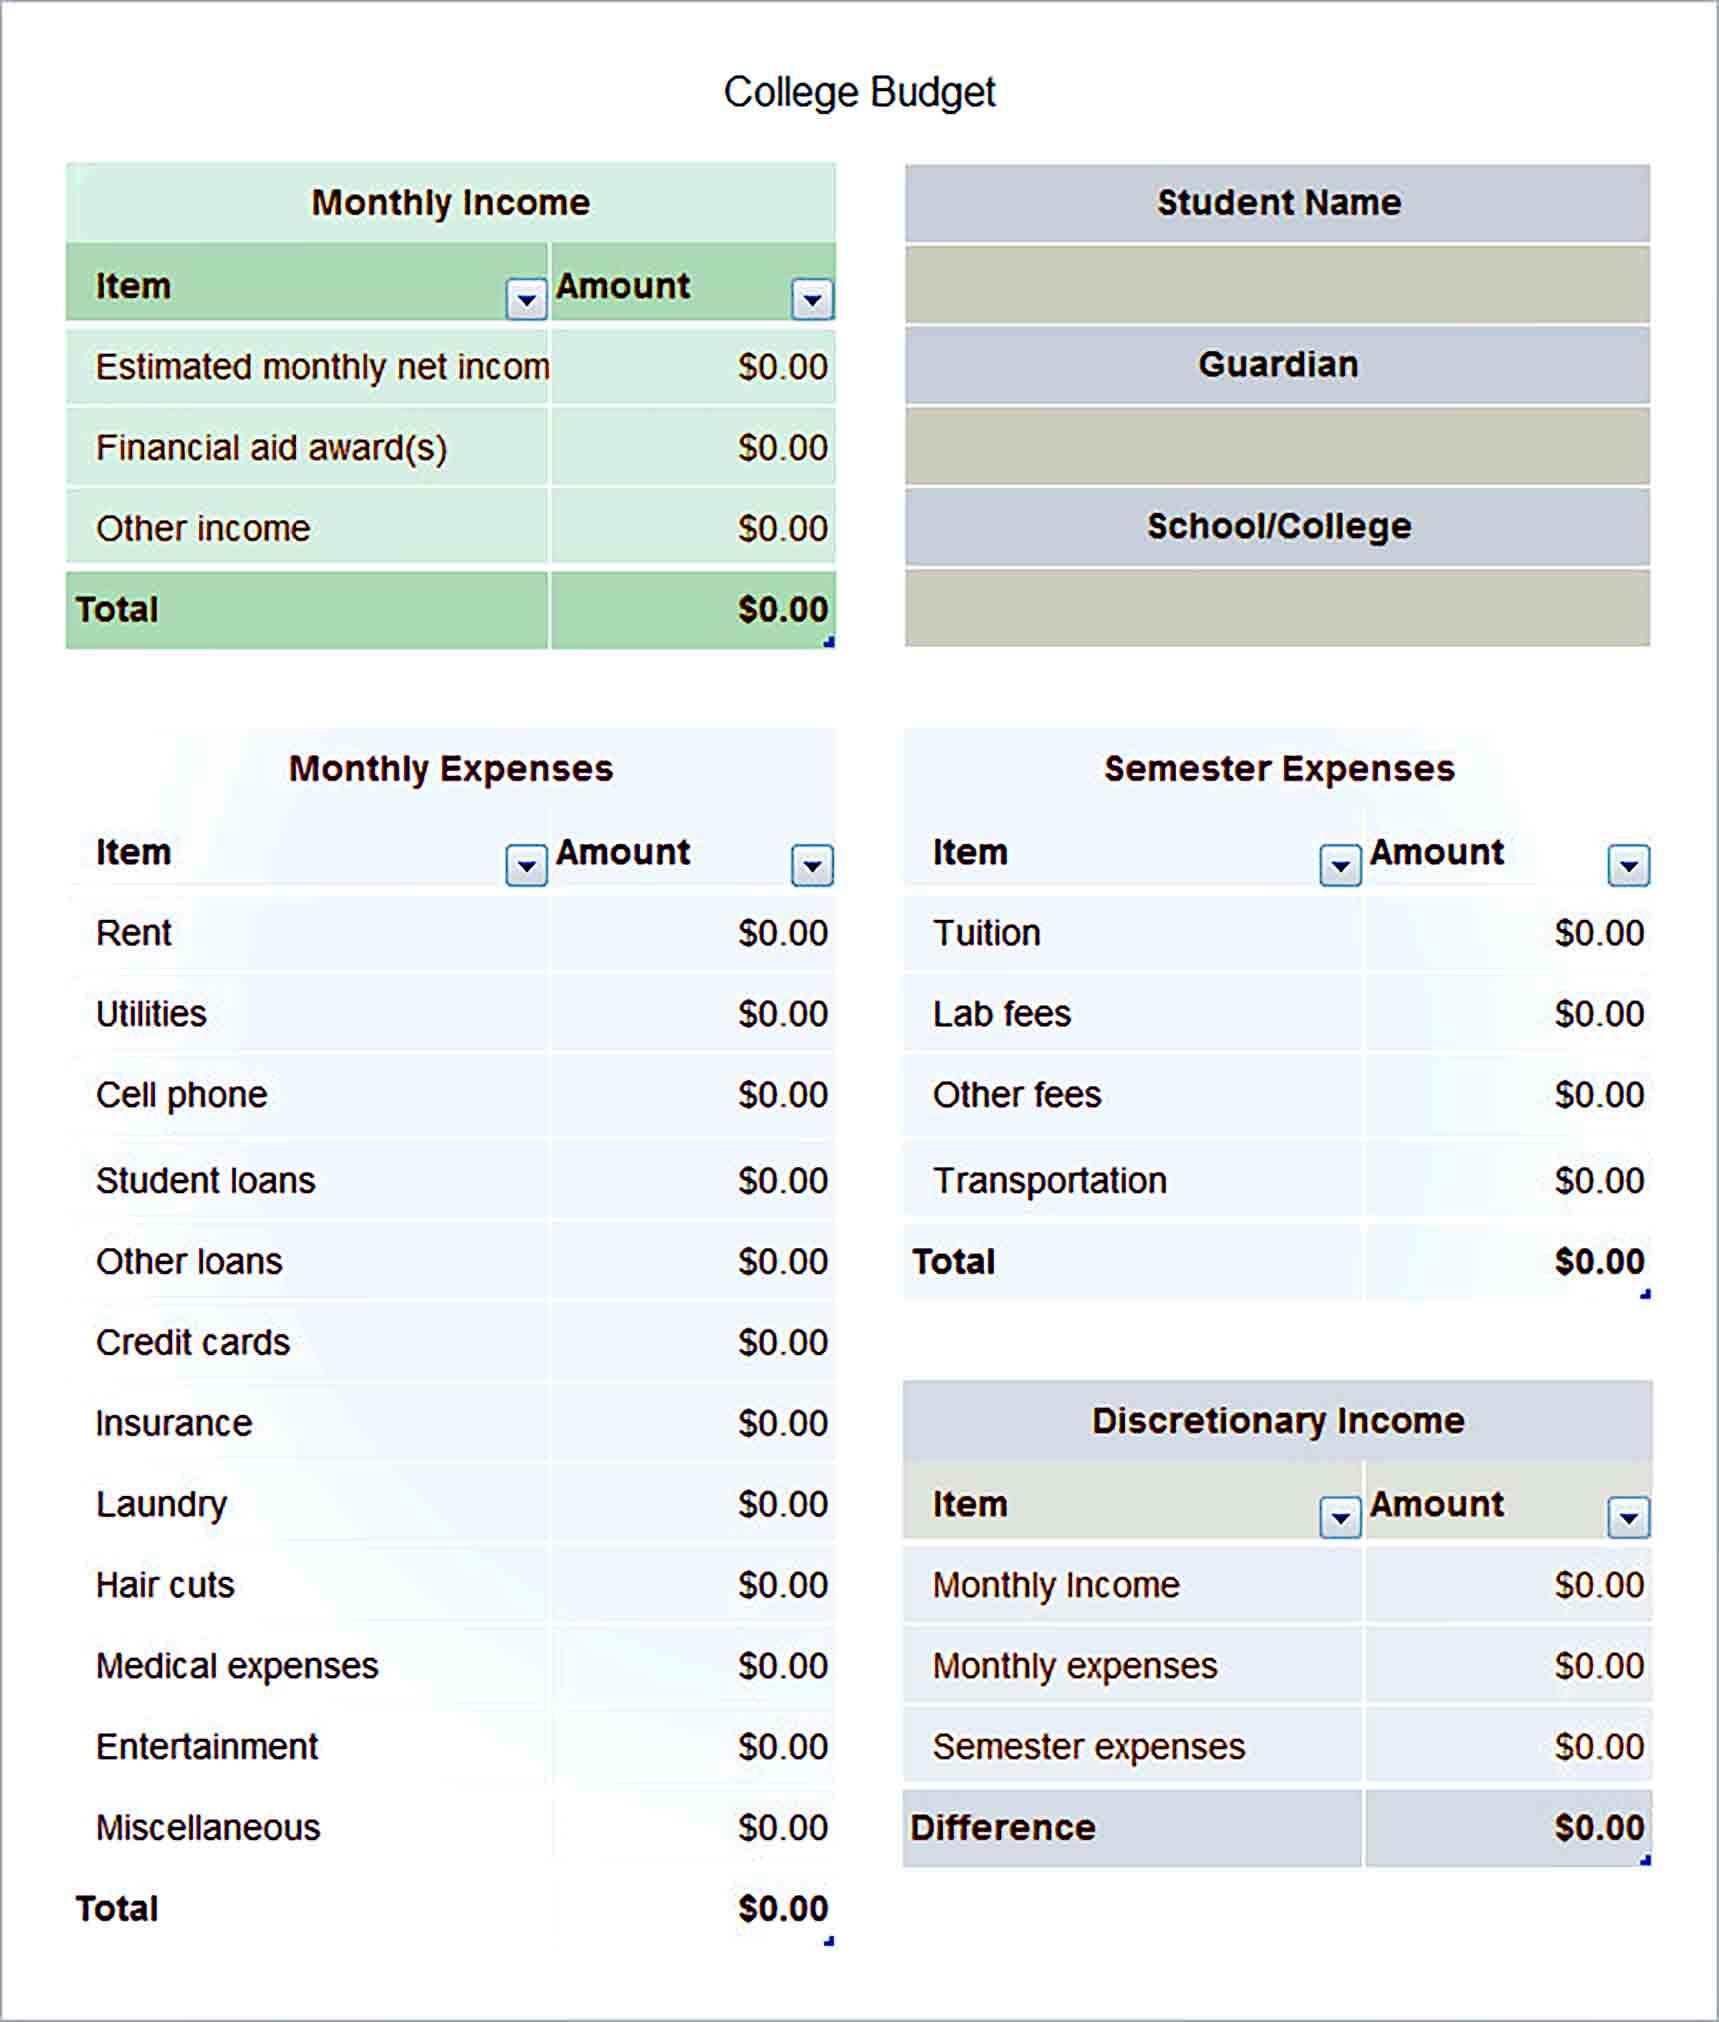 Sample College Budget 002